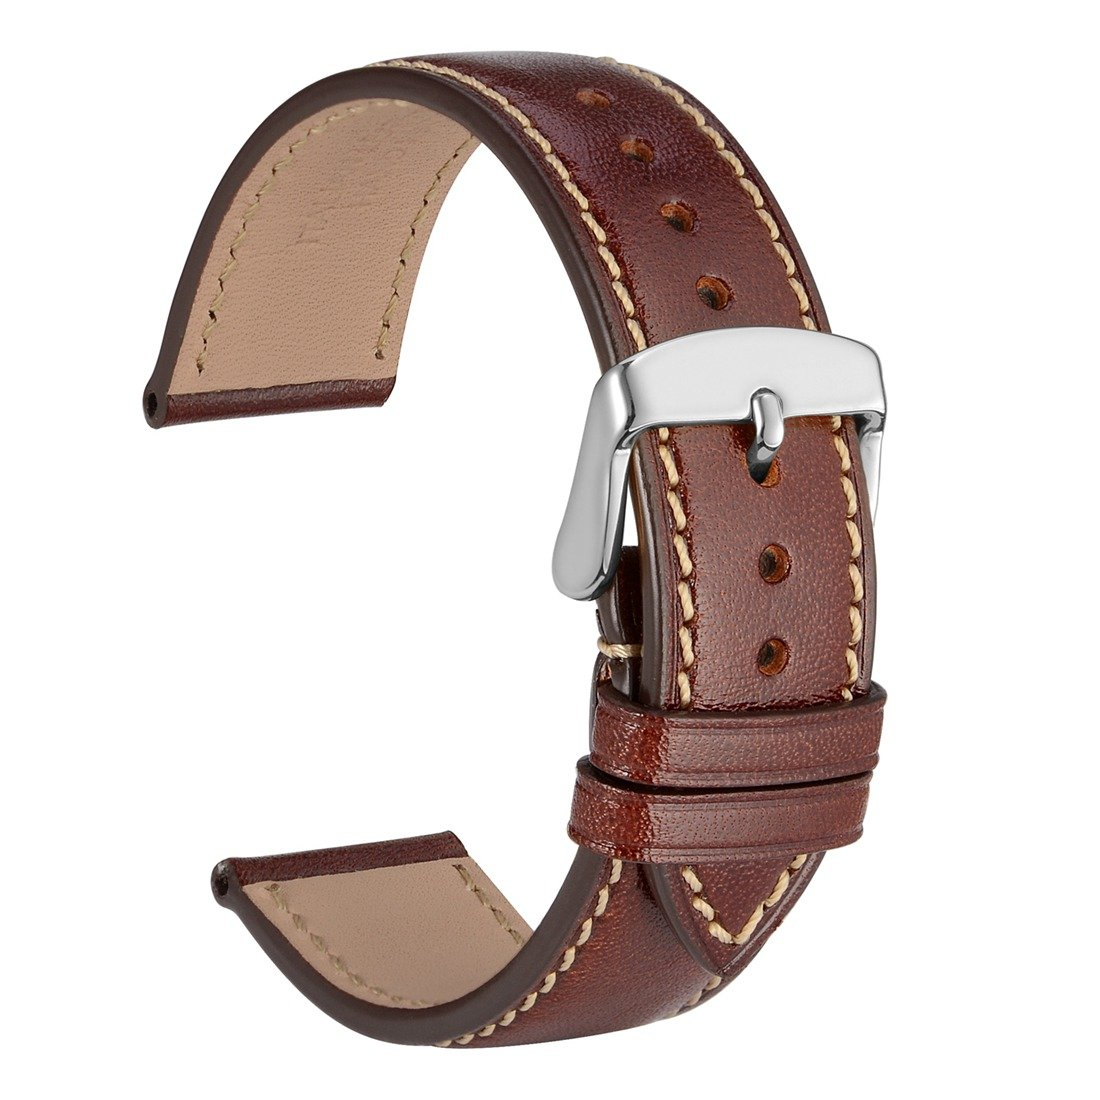 WOCCI-Uhrenarmband-Ersatz-Armbanduhr-Italien-Voll-Korn-Leder-18mm-20mm-oder-22mm